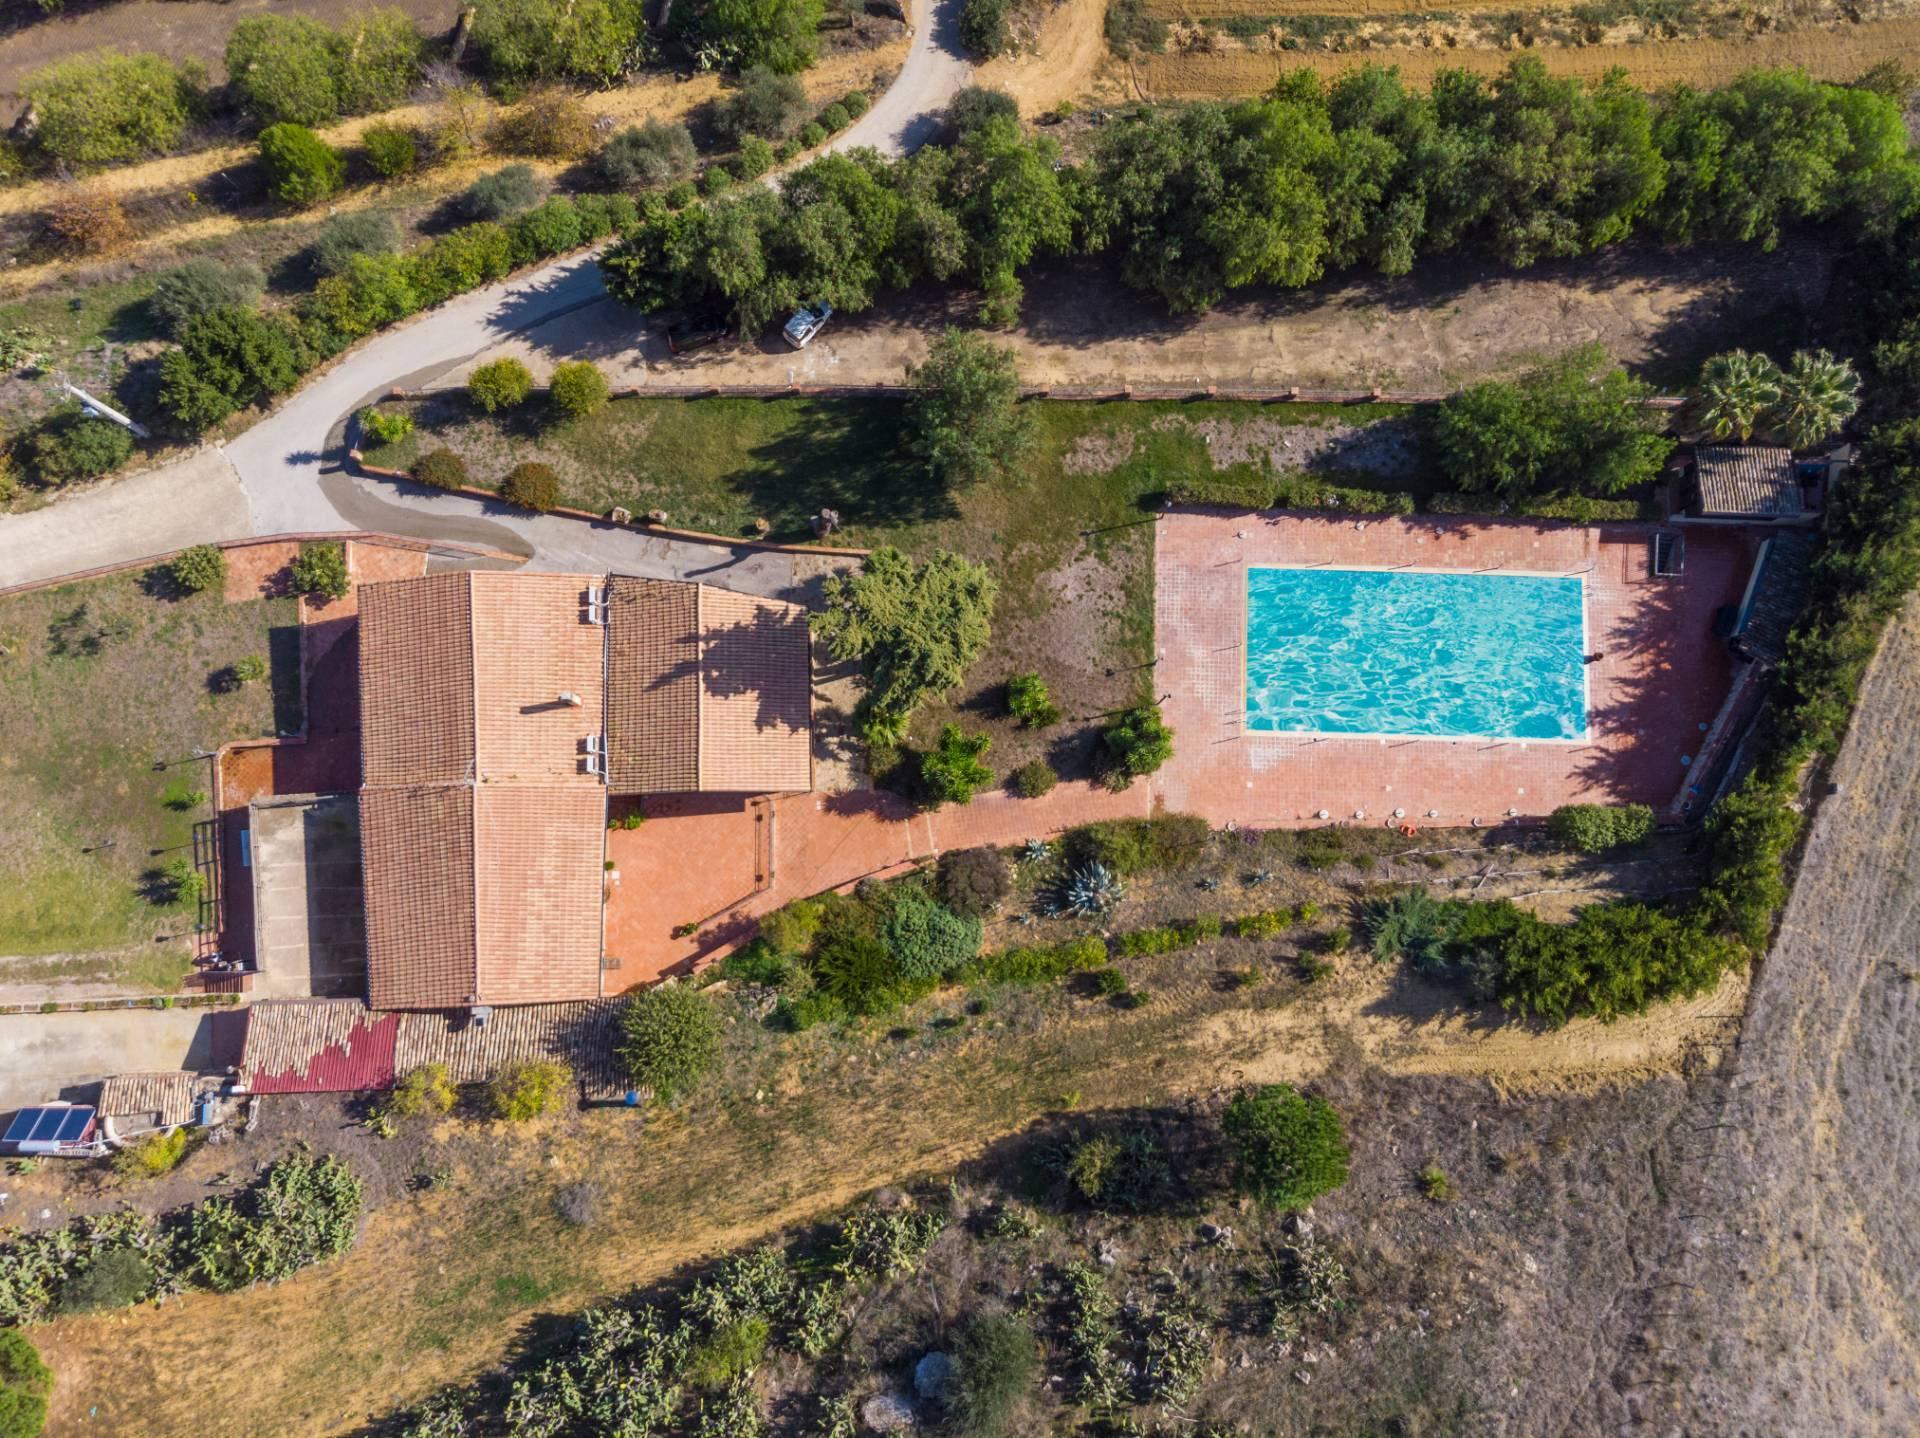 Villa in Vendita a Piazza Armerina: 5 locali, 550 mq - Foto 7